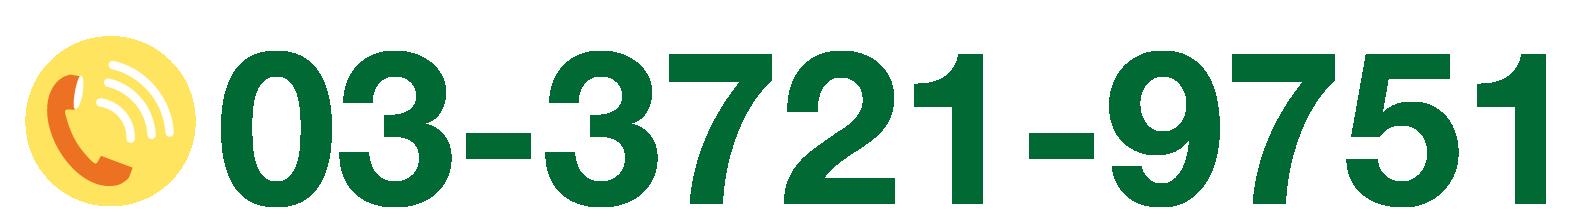 03-3721-9751